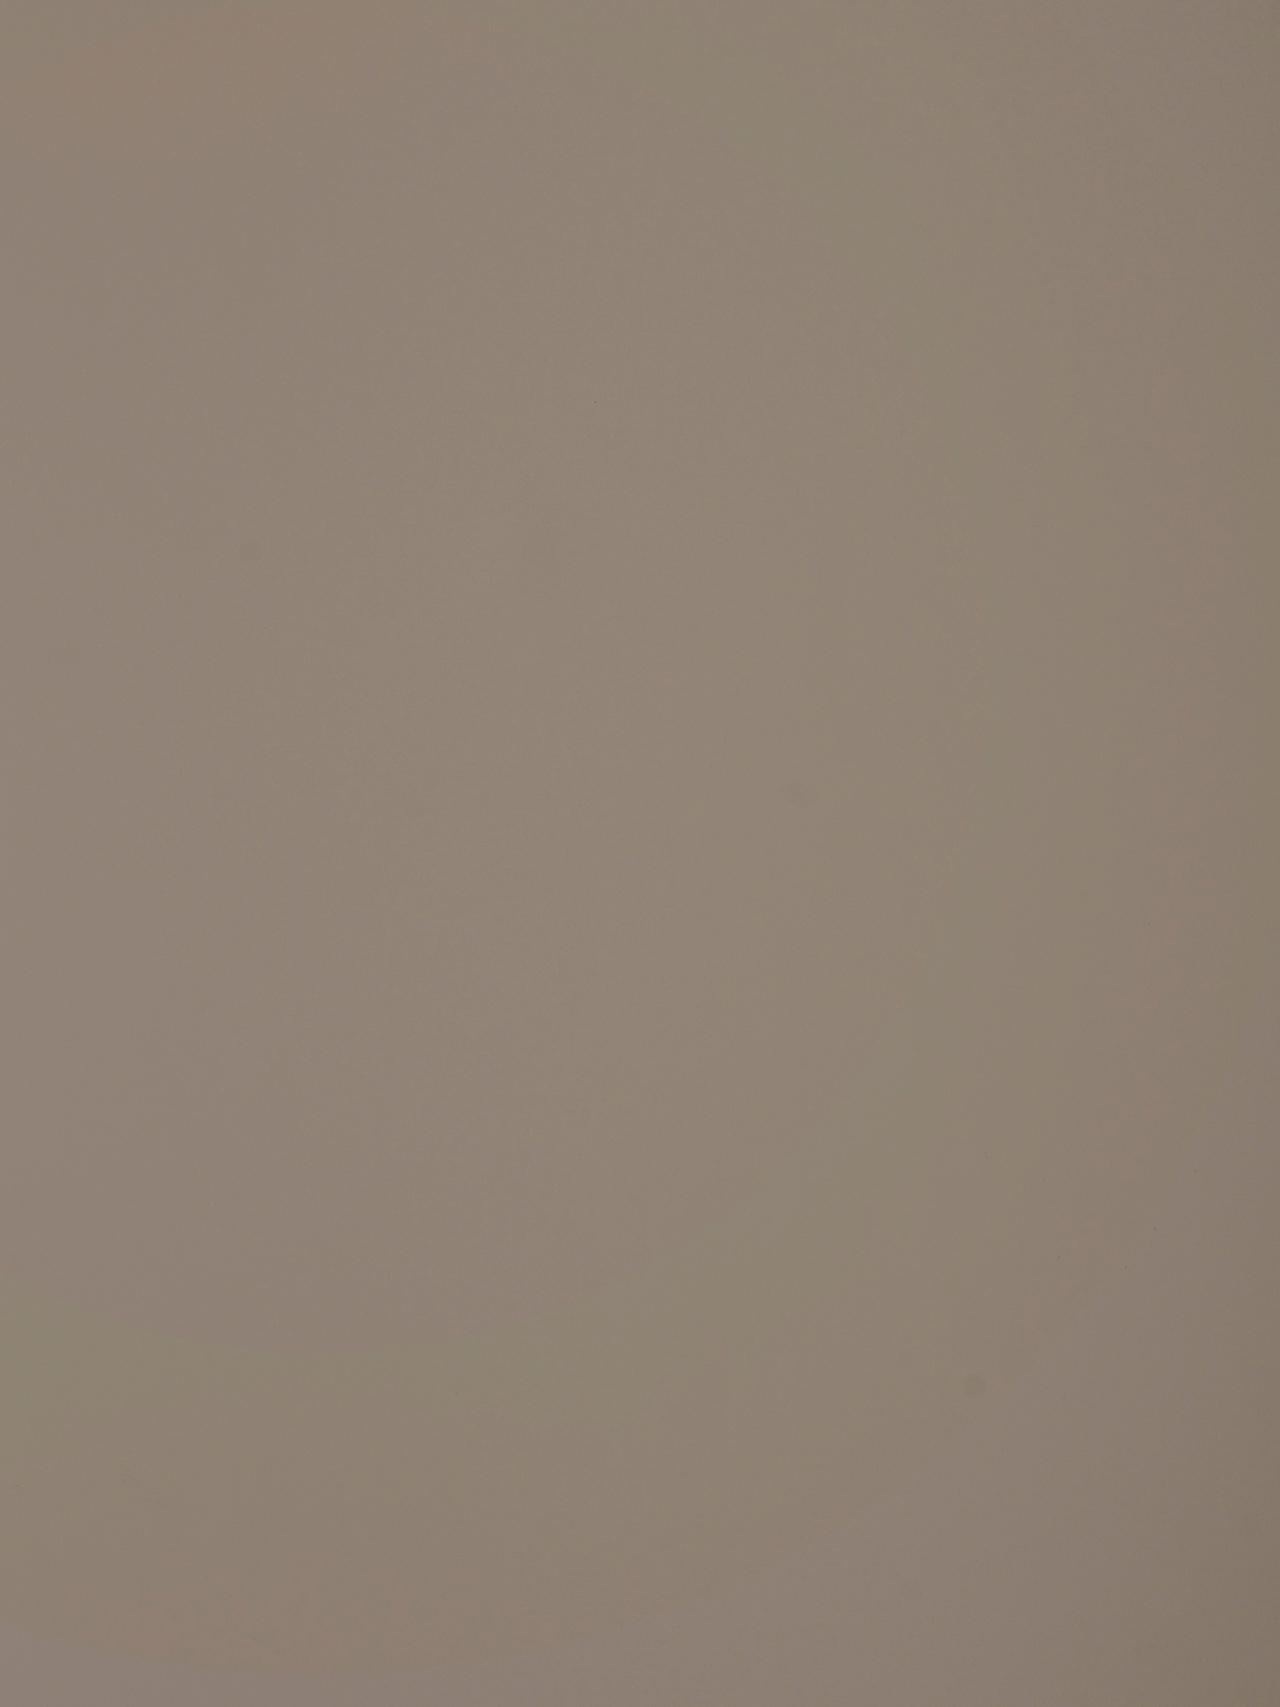 МДФ HM03/UA80 19мм Piombo/Seta 3050х1300мм